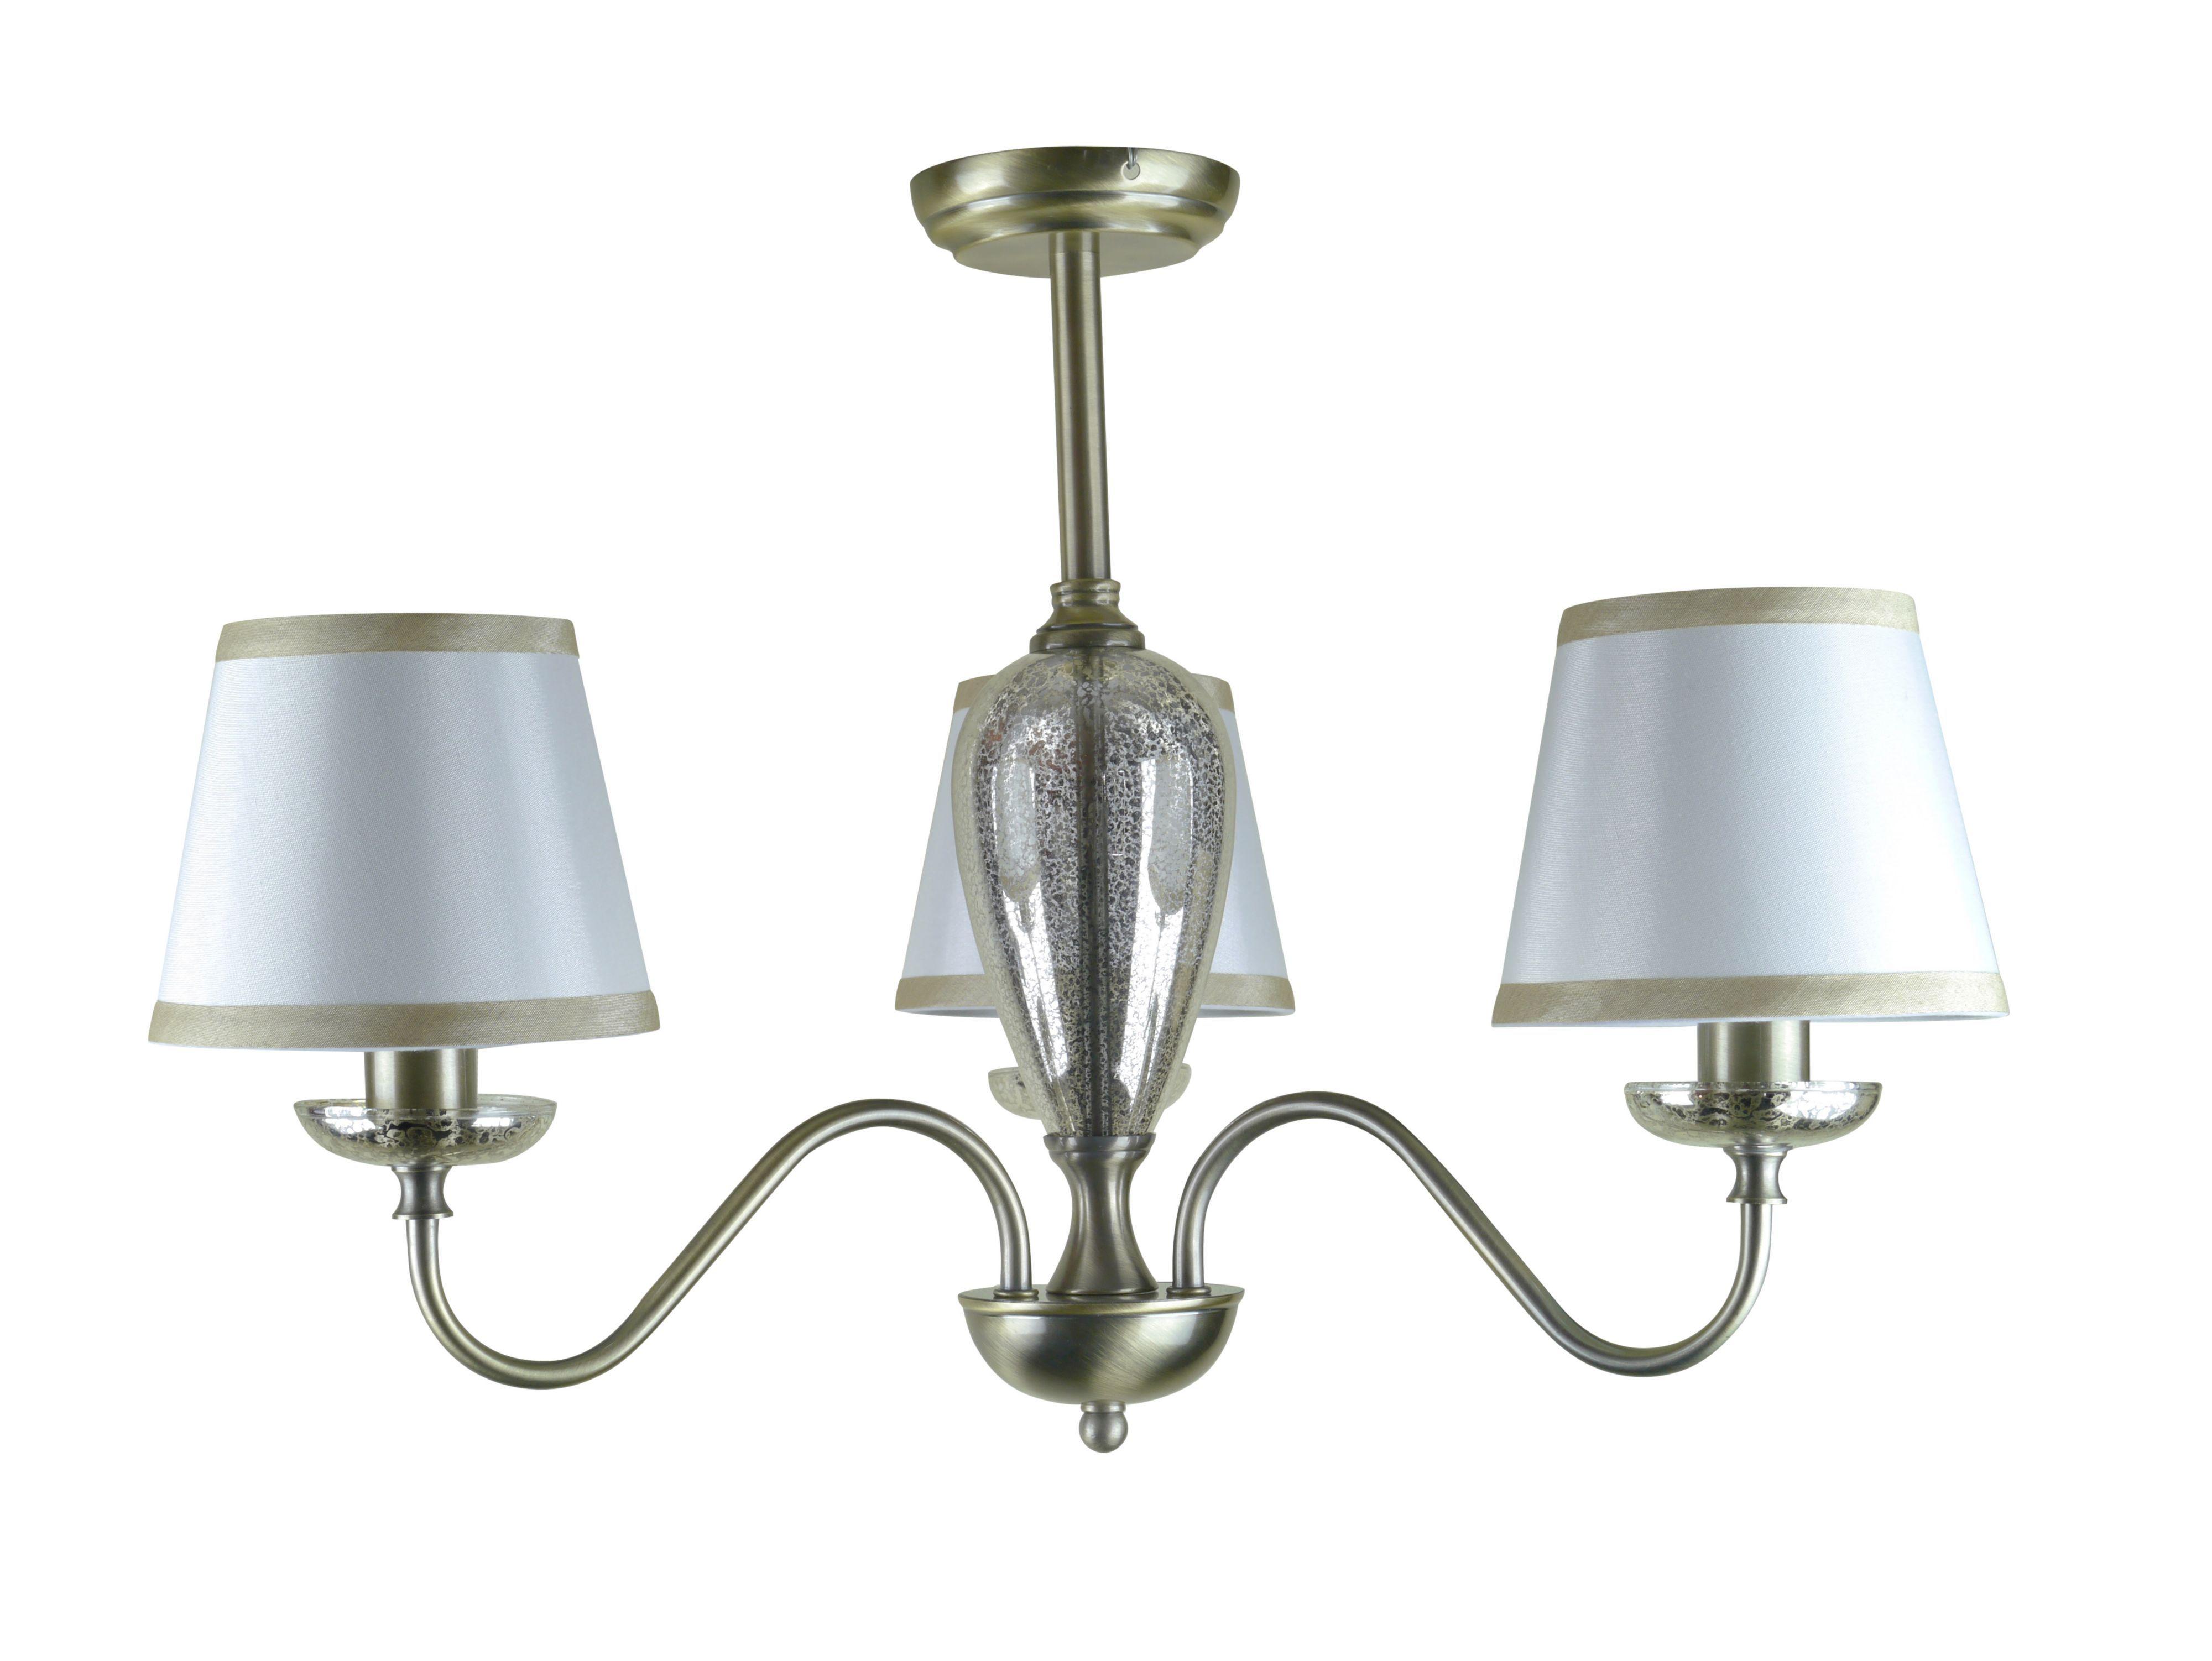 Manor Antique Brass Effect 3 Lamp Ceiling Light